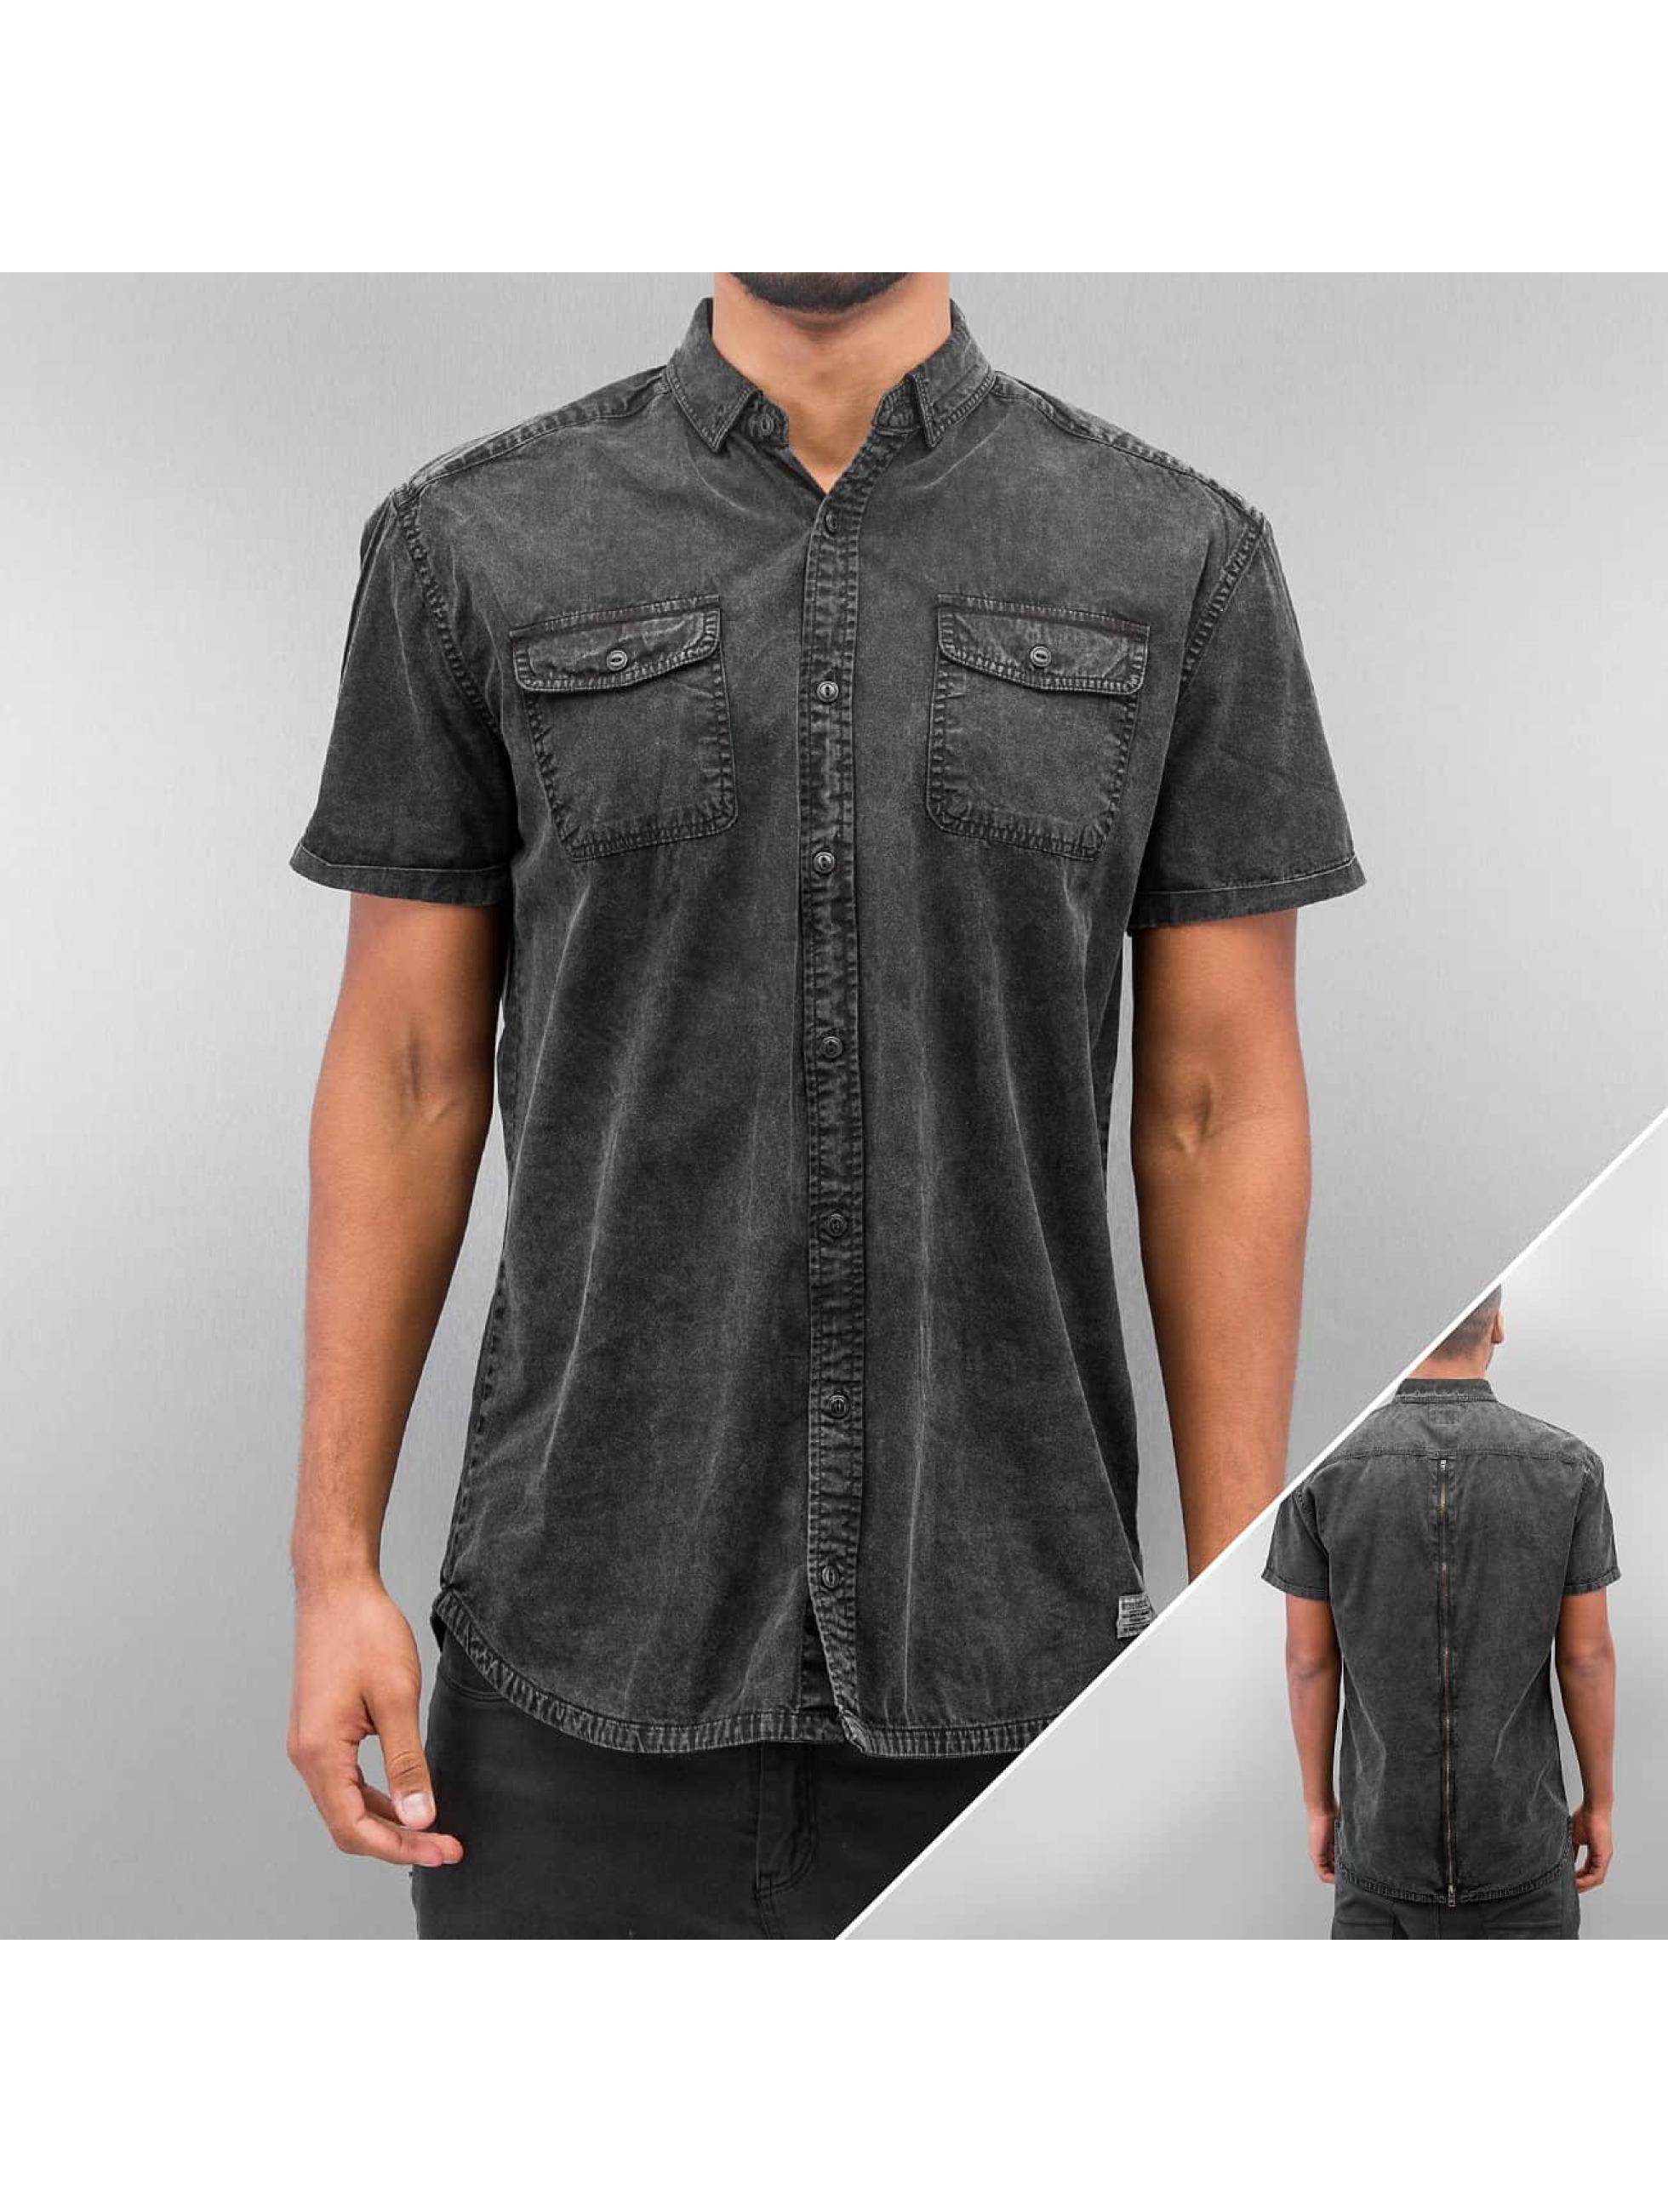 SHINE Original overhemd Washed And Worn Out zwart